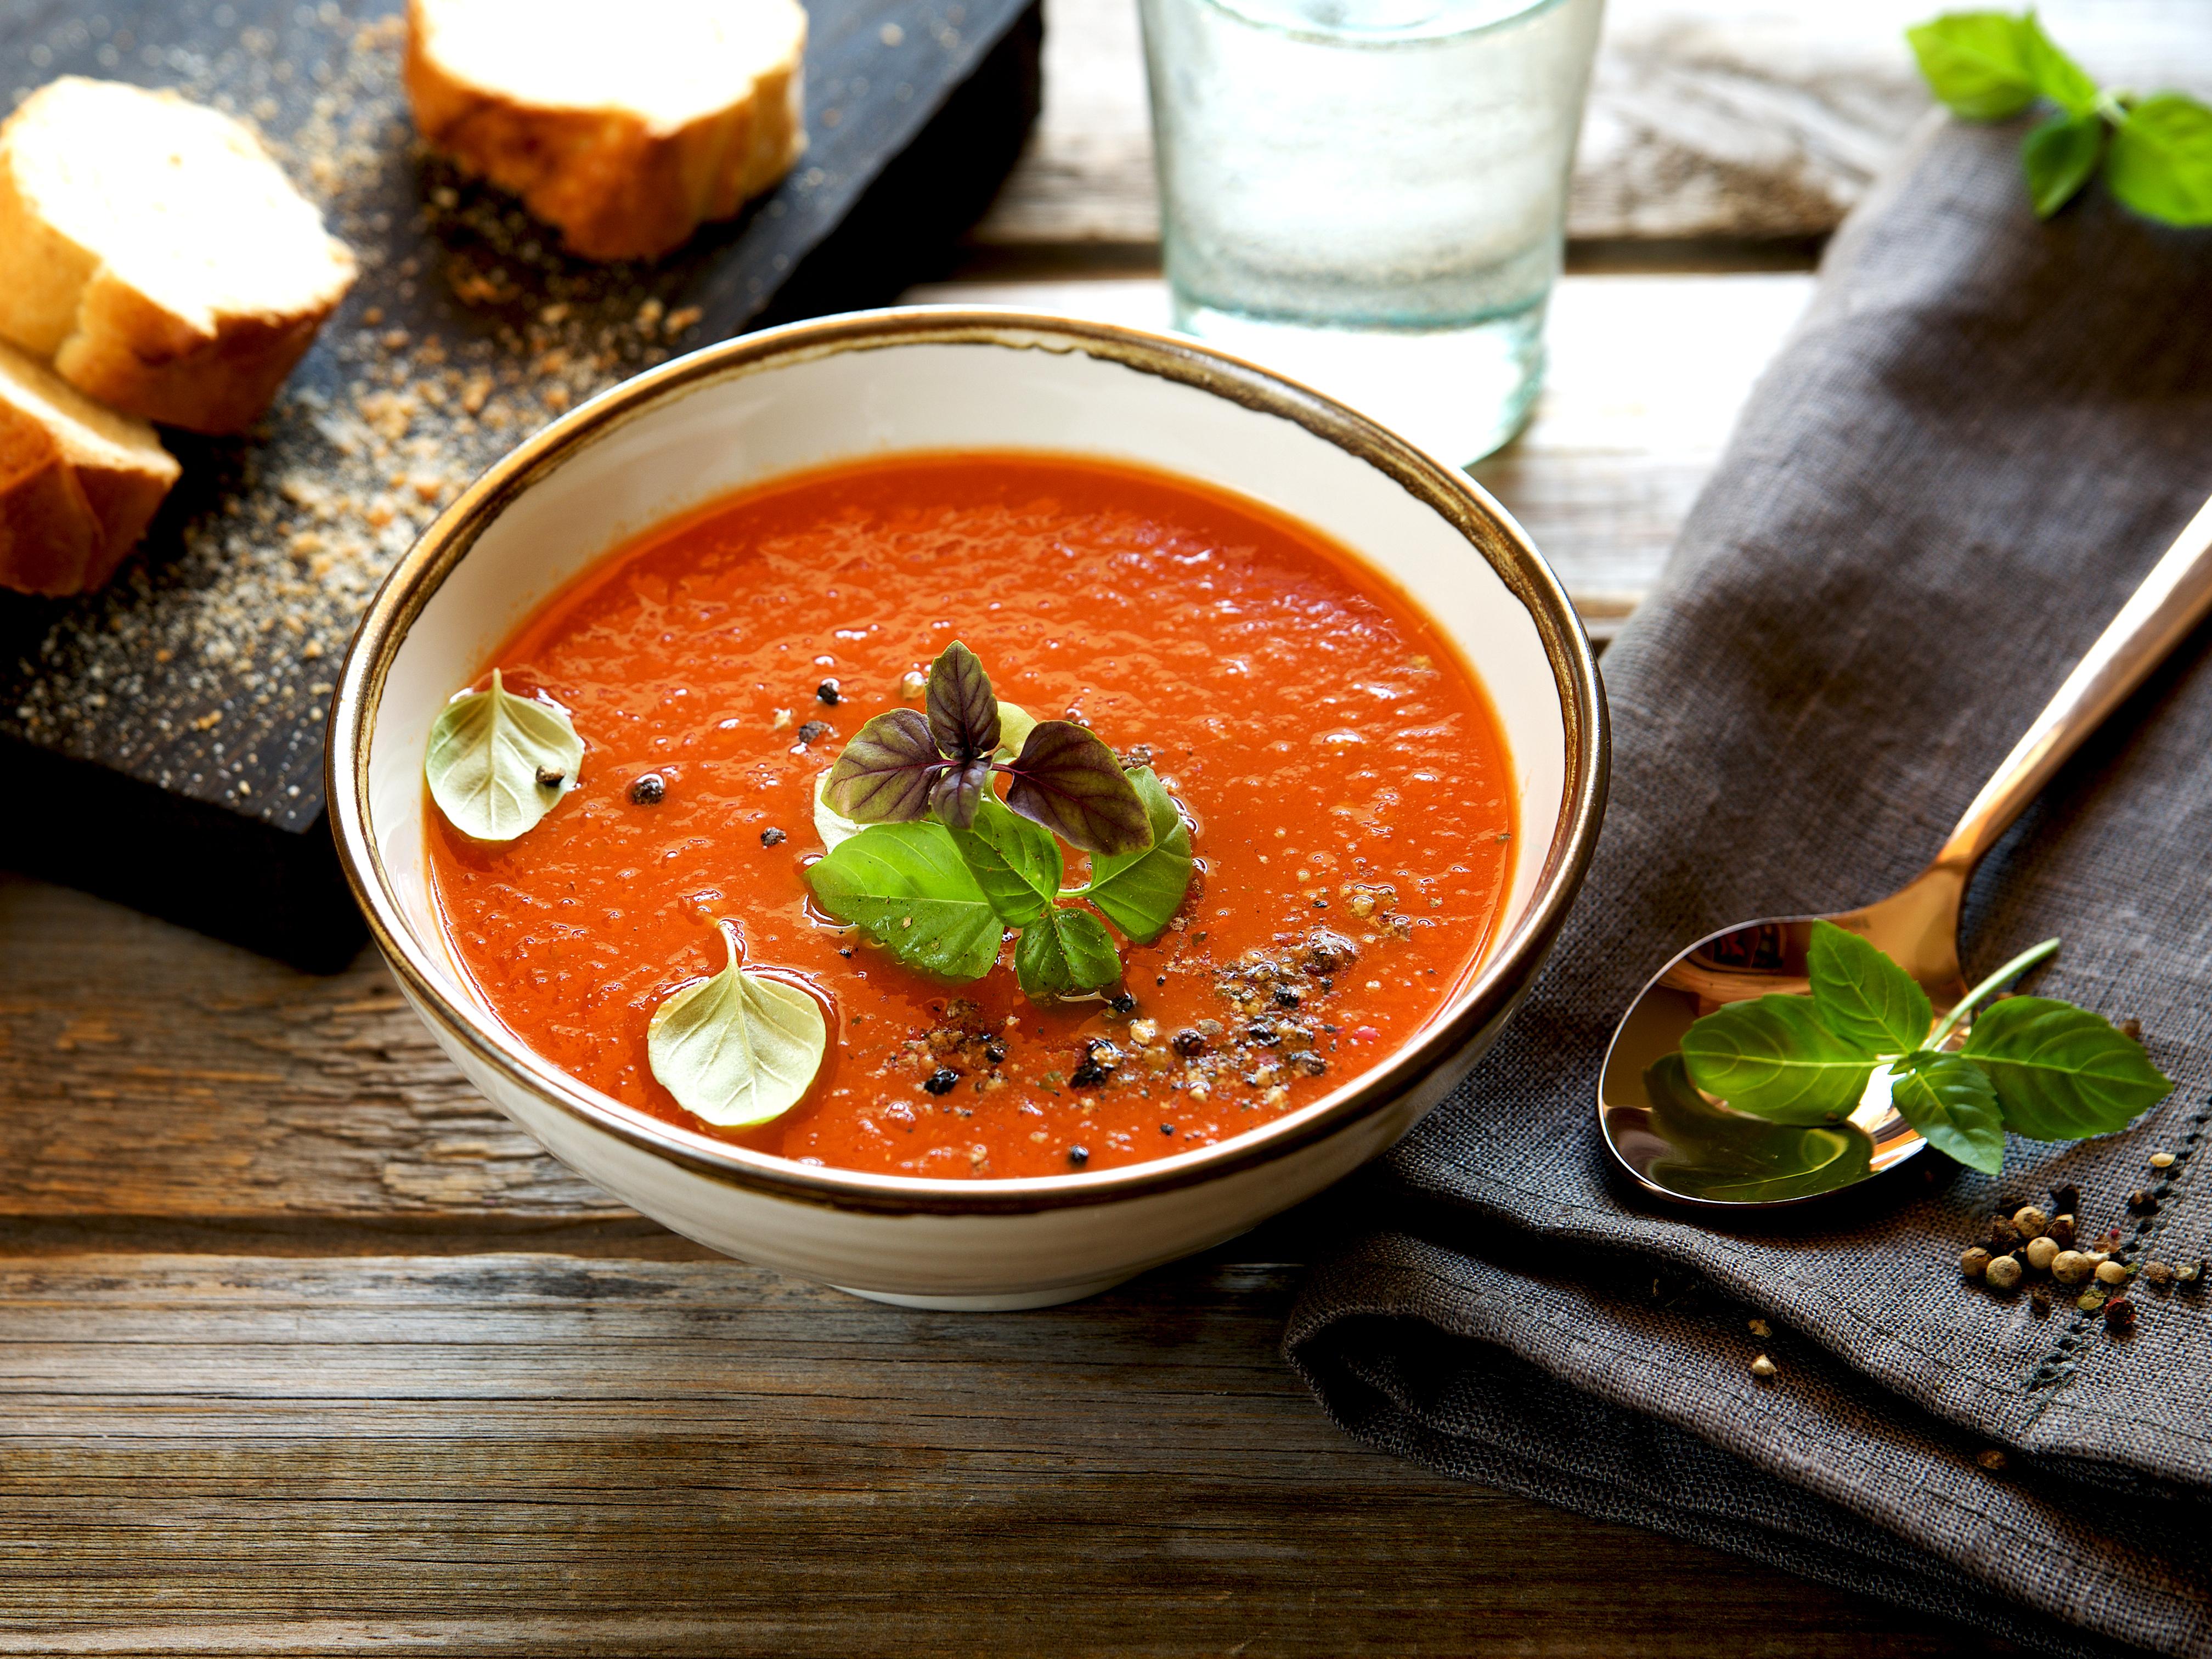 Soupe-froide-tomate-dorothee-lepicurienne-a-la-une